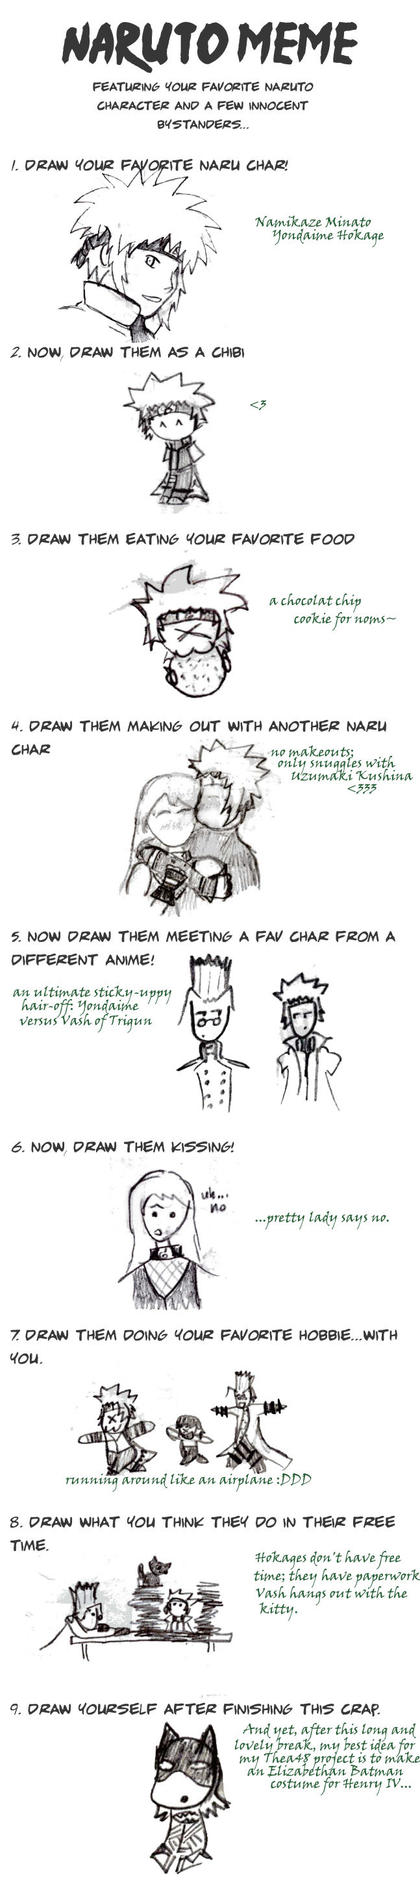 Cilriaco's Naruto Meme: 4th by semchance